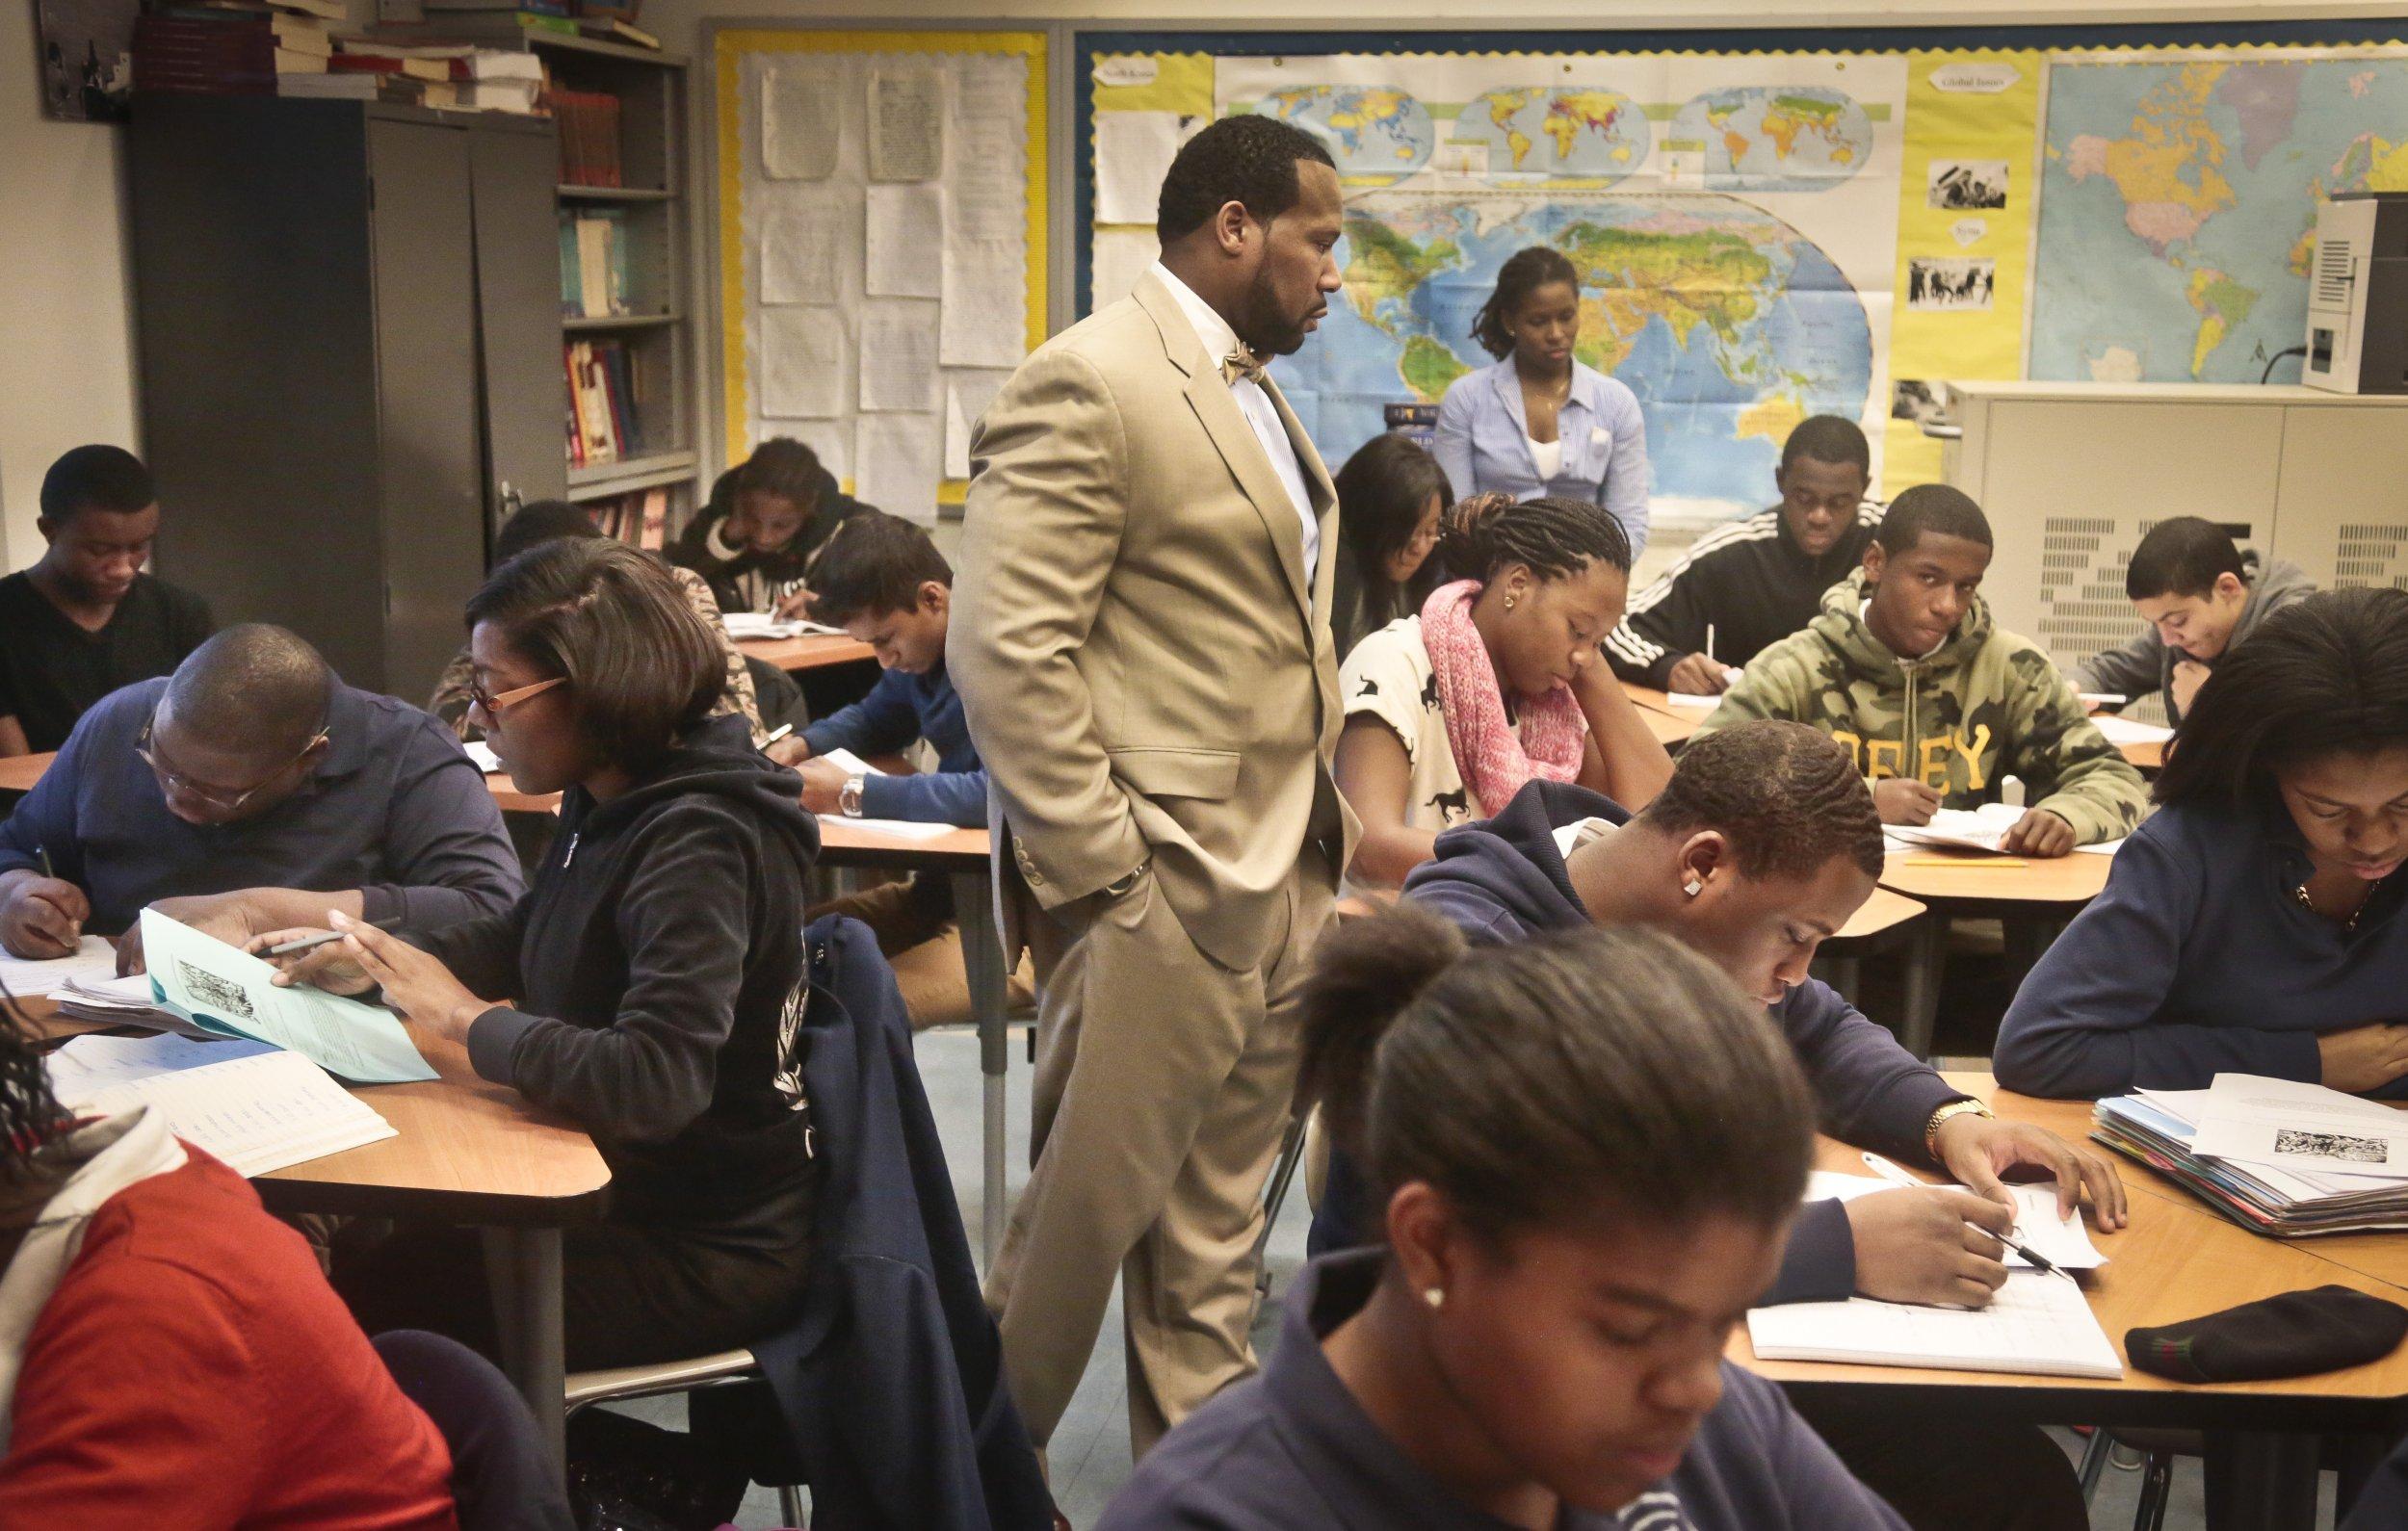 School Segregation Is Getting Worse as Wealthier, Whiter ...